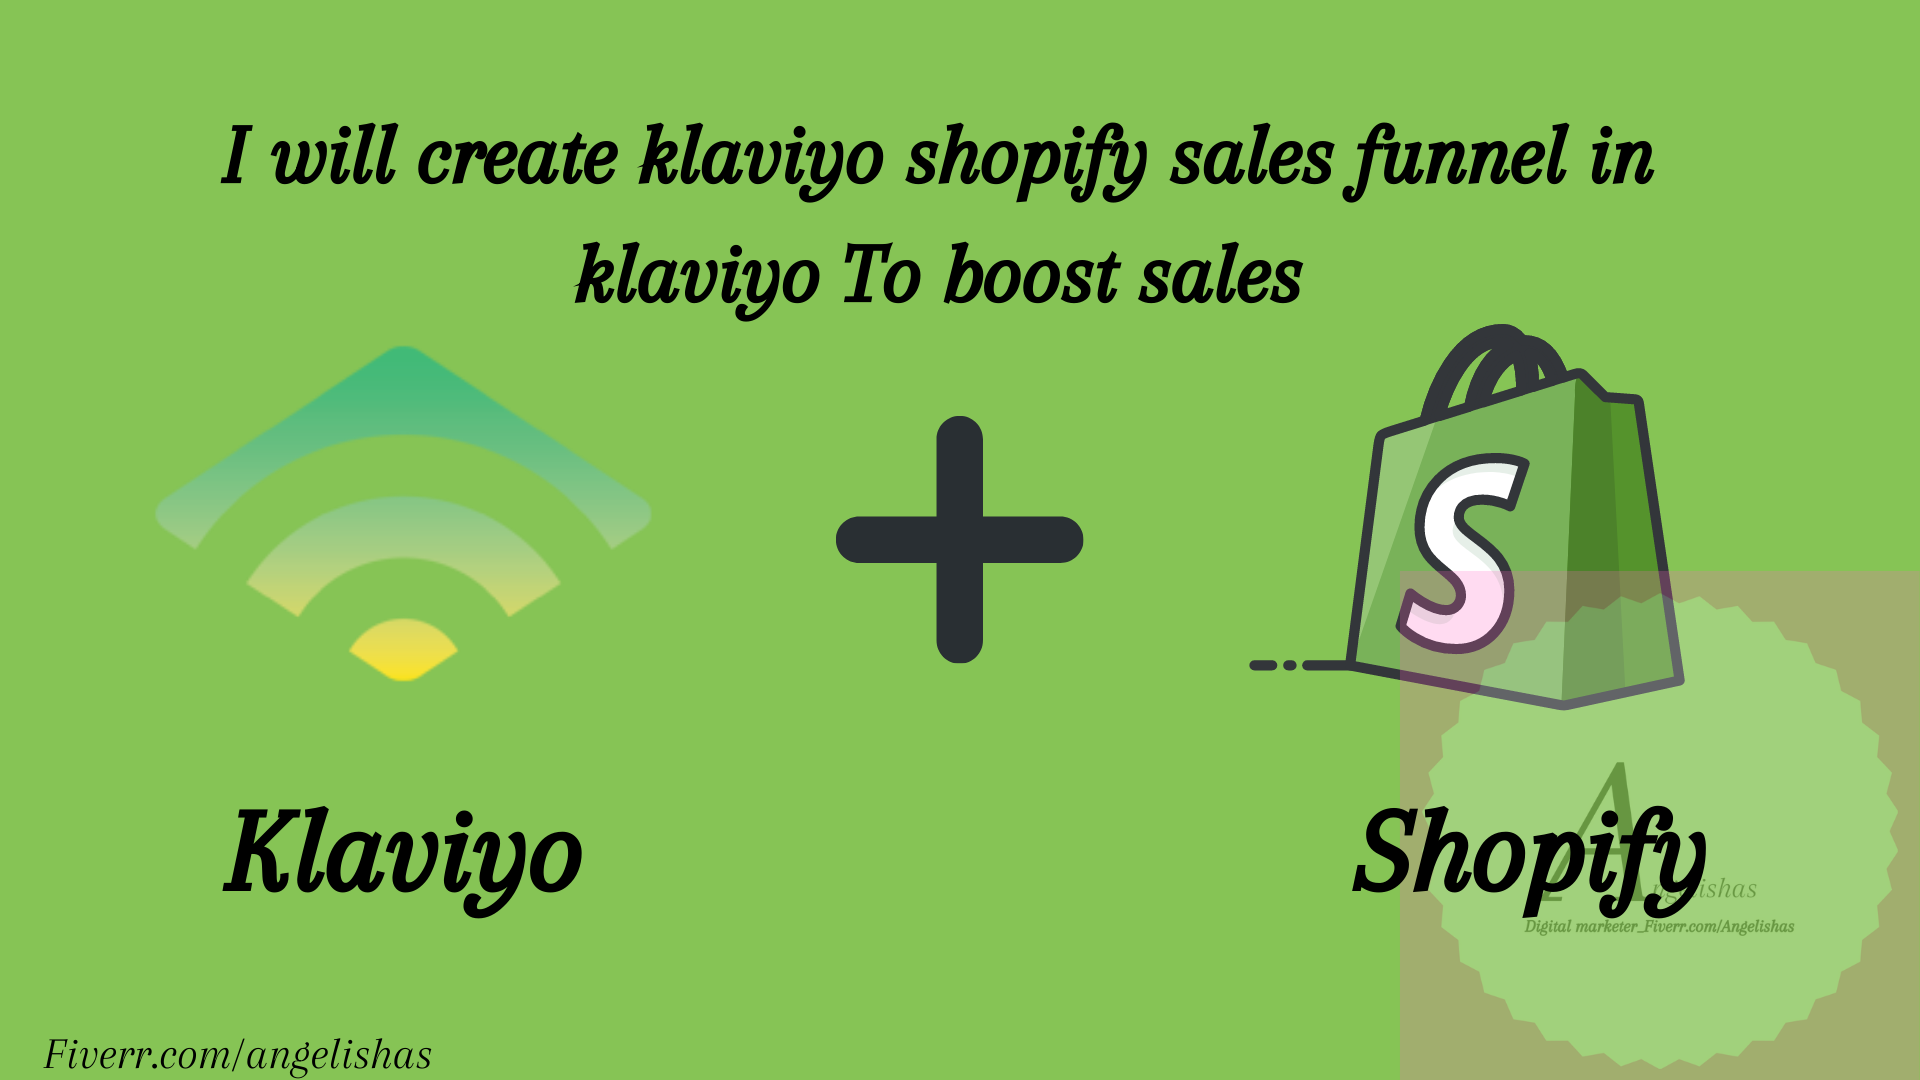 I will create klaviyo marketing sales funnel, Email sales funnel shopify marketing, FiverrBox